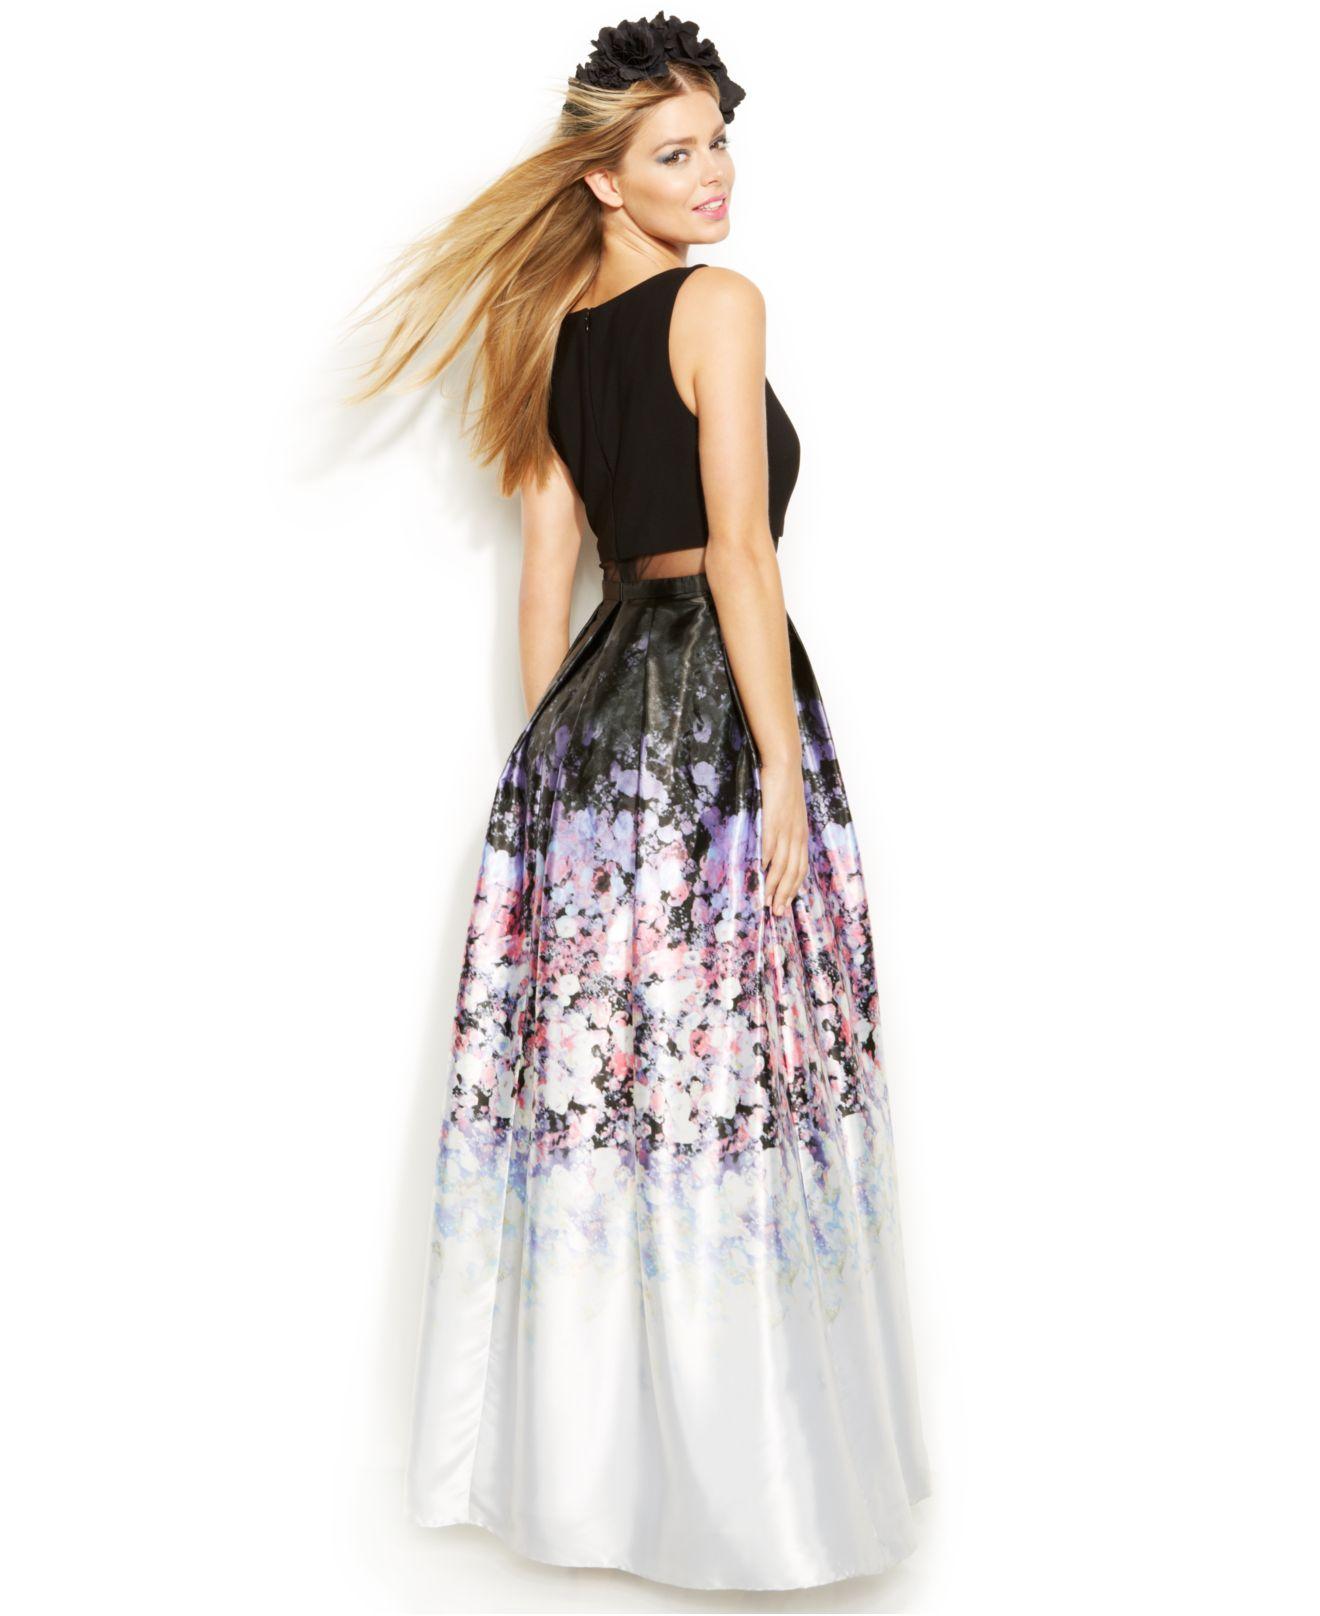 Betsy Adams Dresses Evening Black – fashion dresses